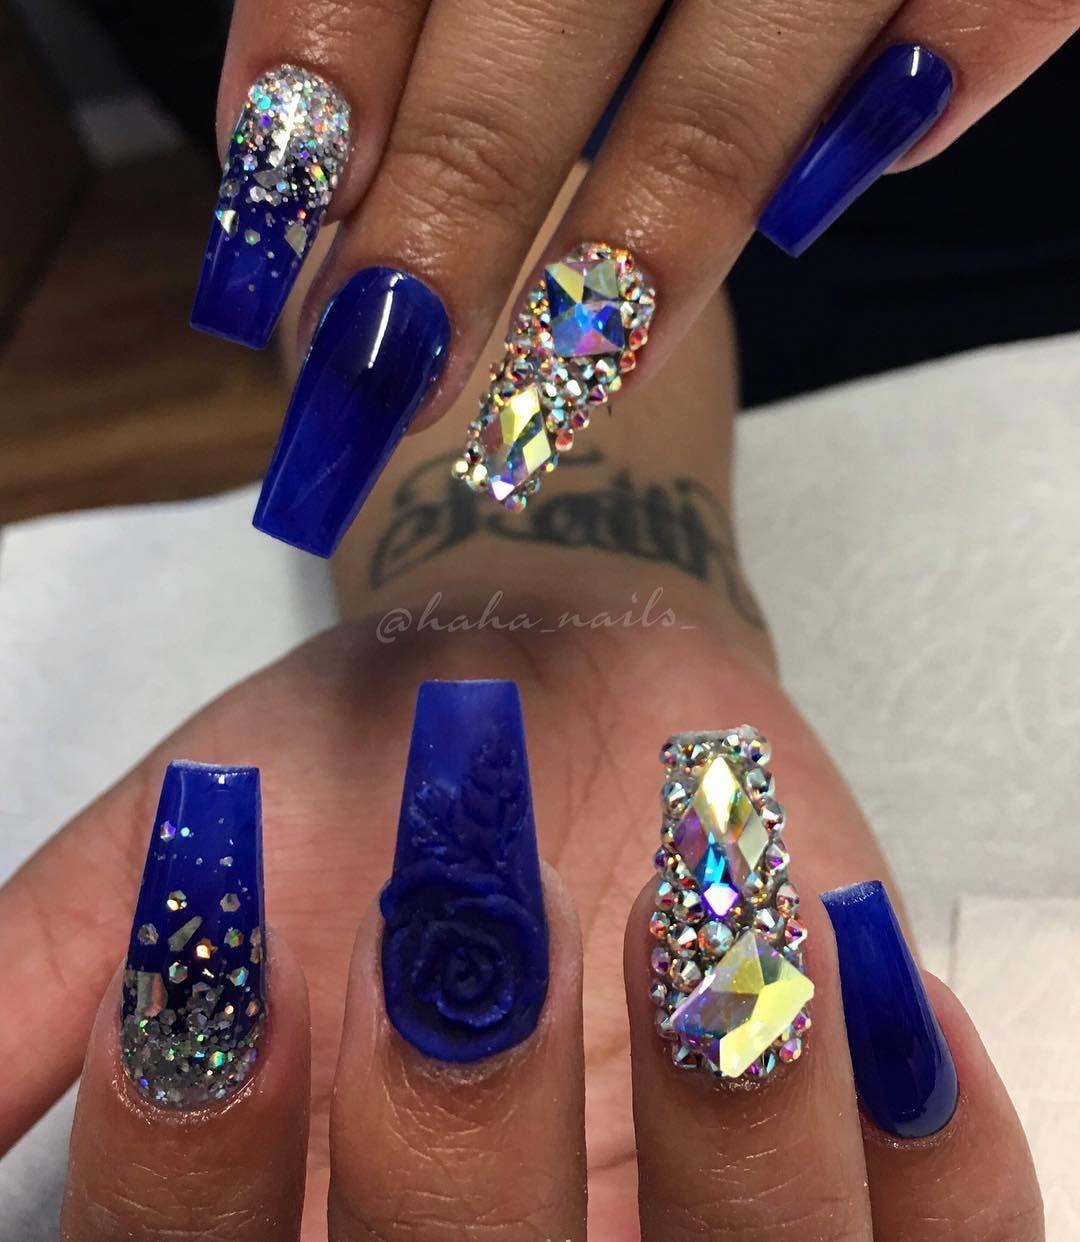 Royal Blue Rose And Mirror Glitter Nails 10 Impressive Coffin Nails Ballerina Nail Designs Ballerina Nails Designs Royal Blue Nails Prom Nails